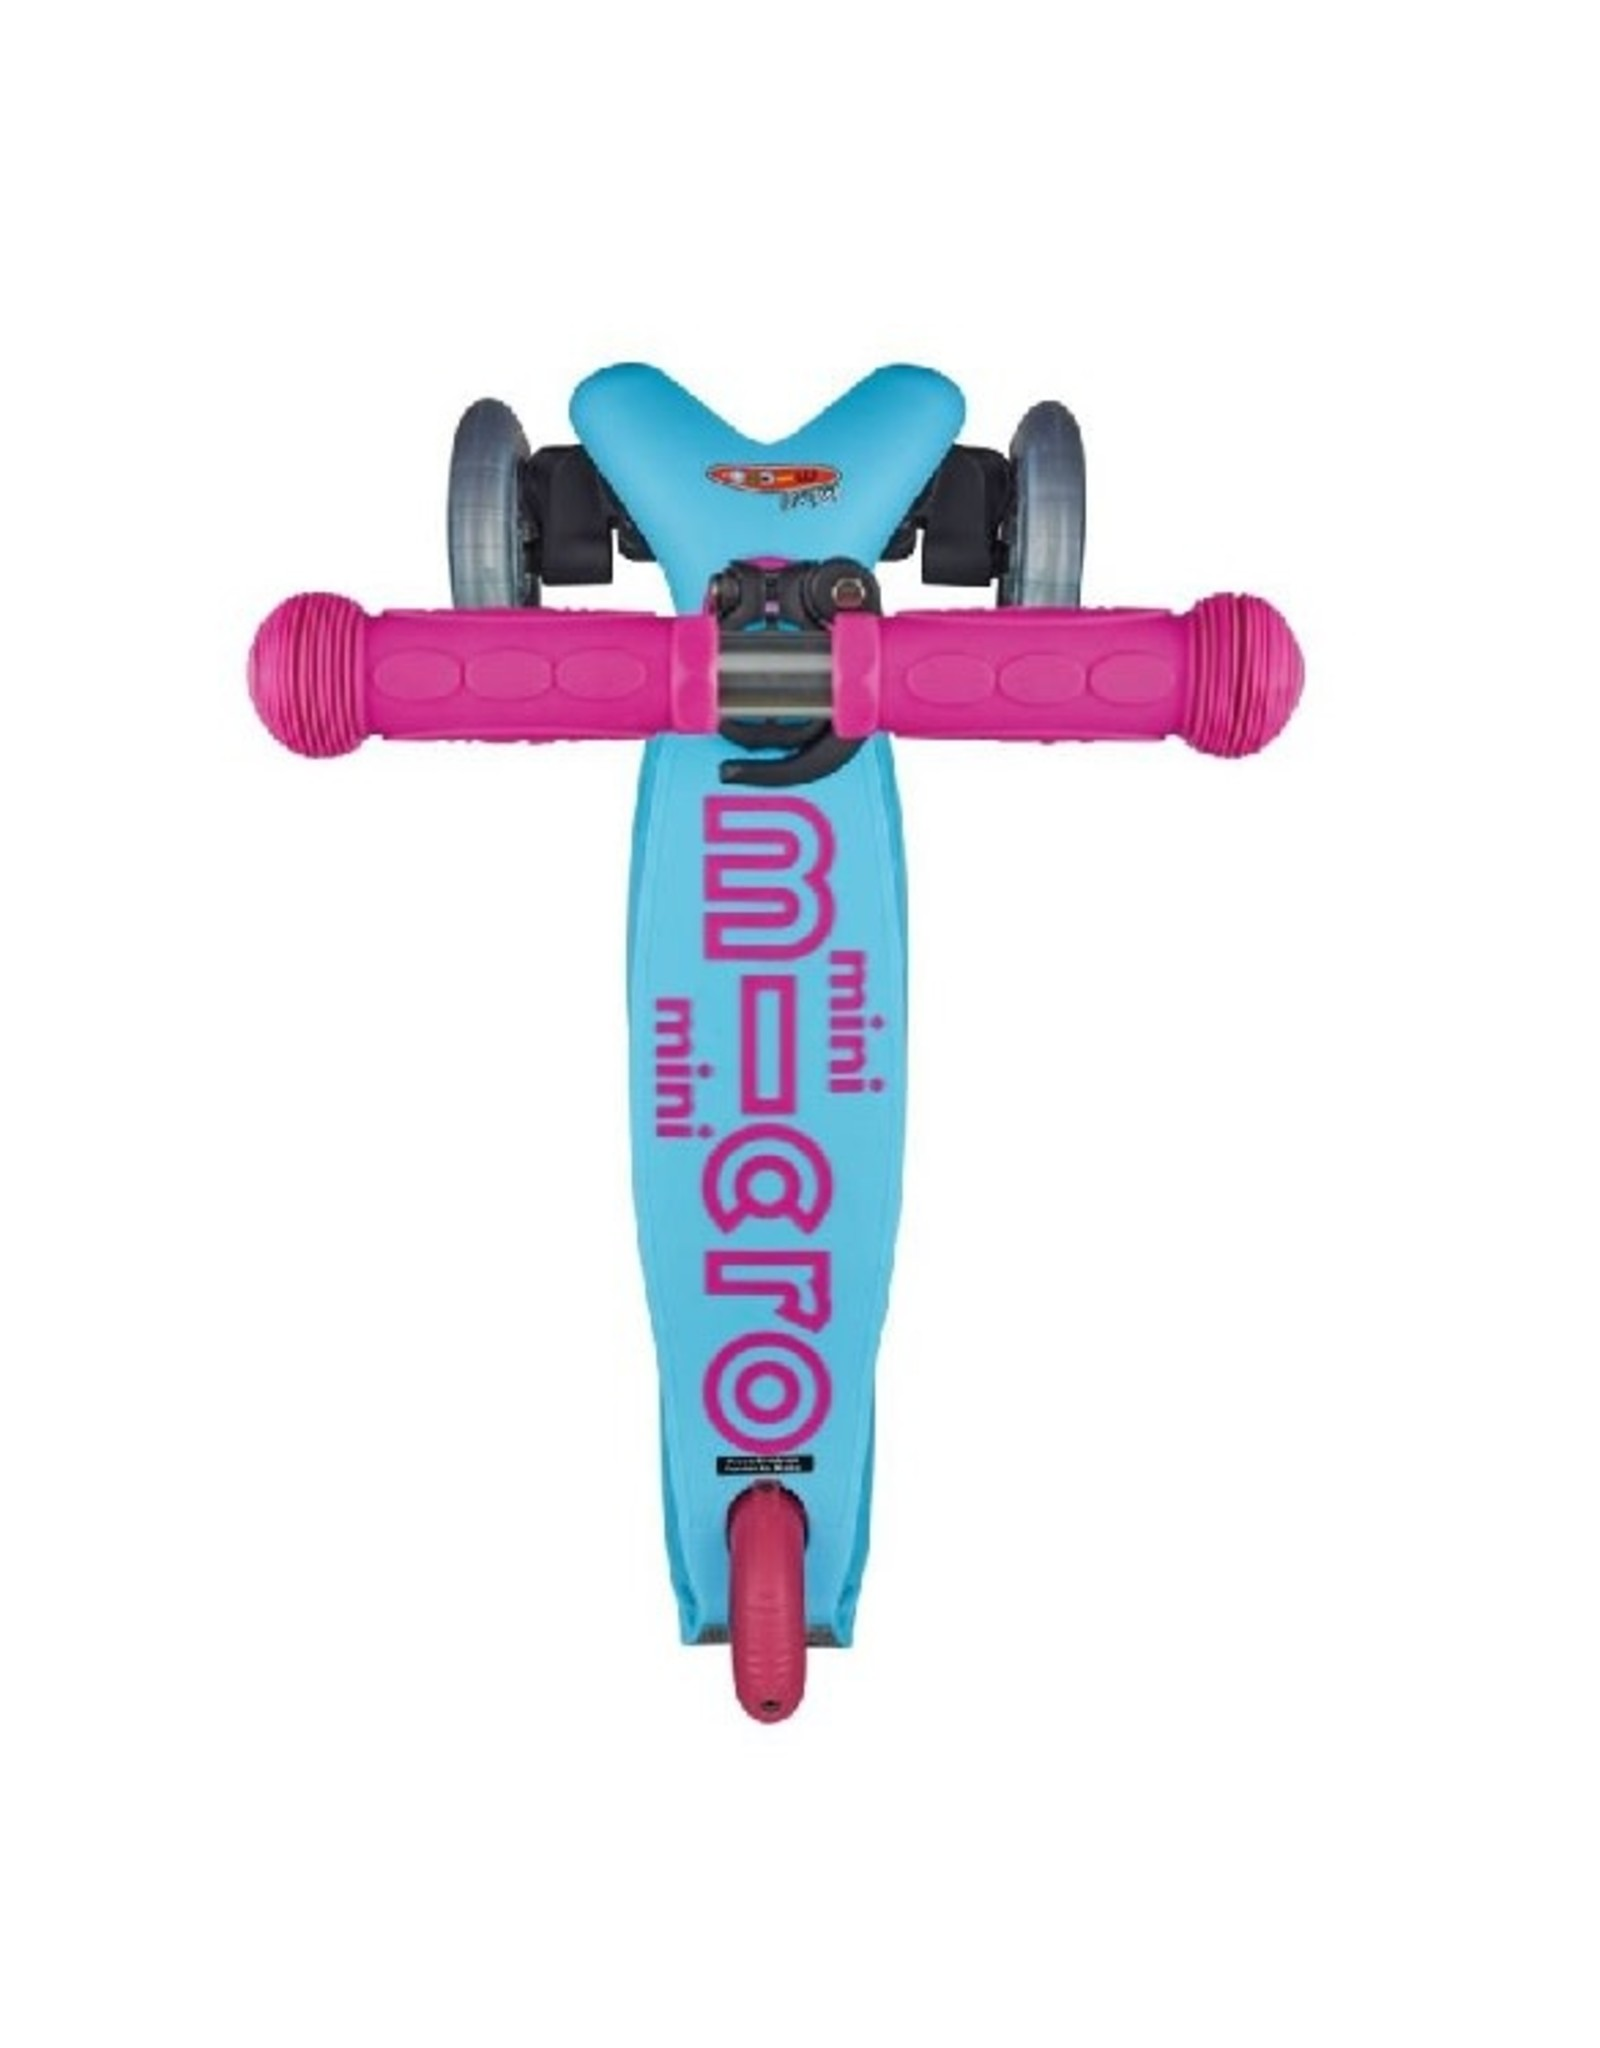 Micro Step Mini Micro Step Deluxe aqua/pink